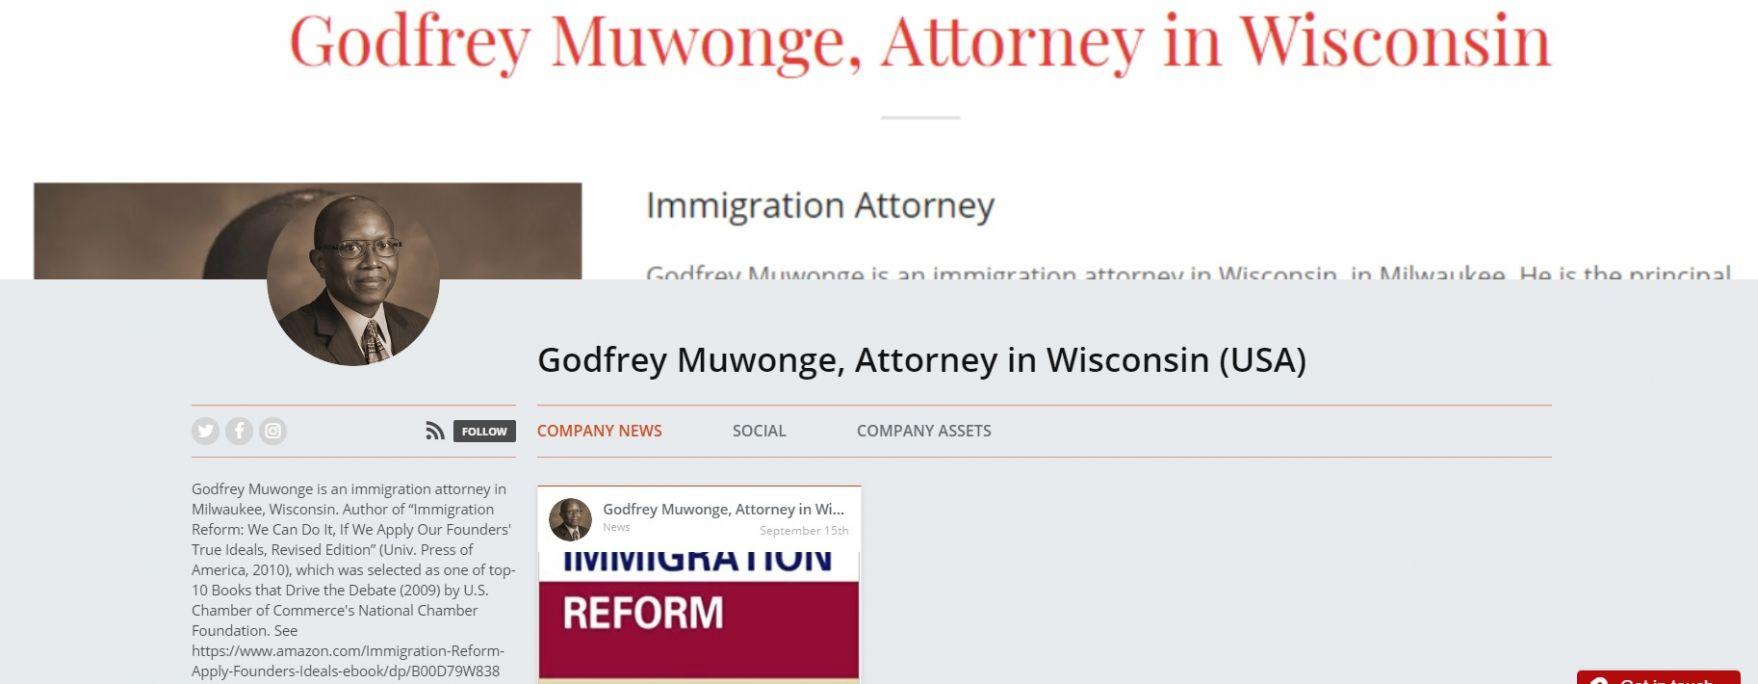 News about Godfrey Muwonge, Attorney in Wisconsin